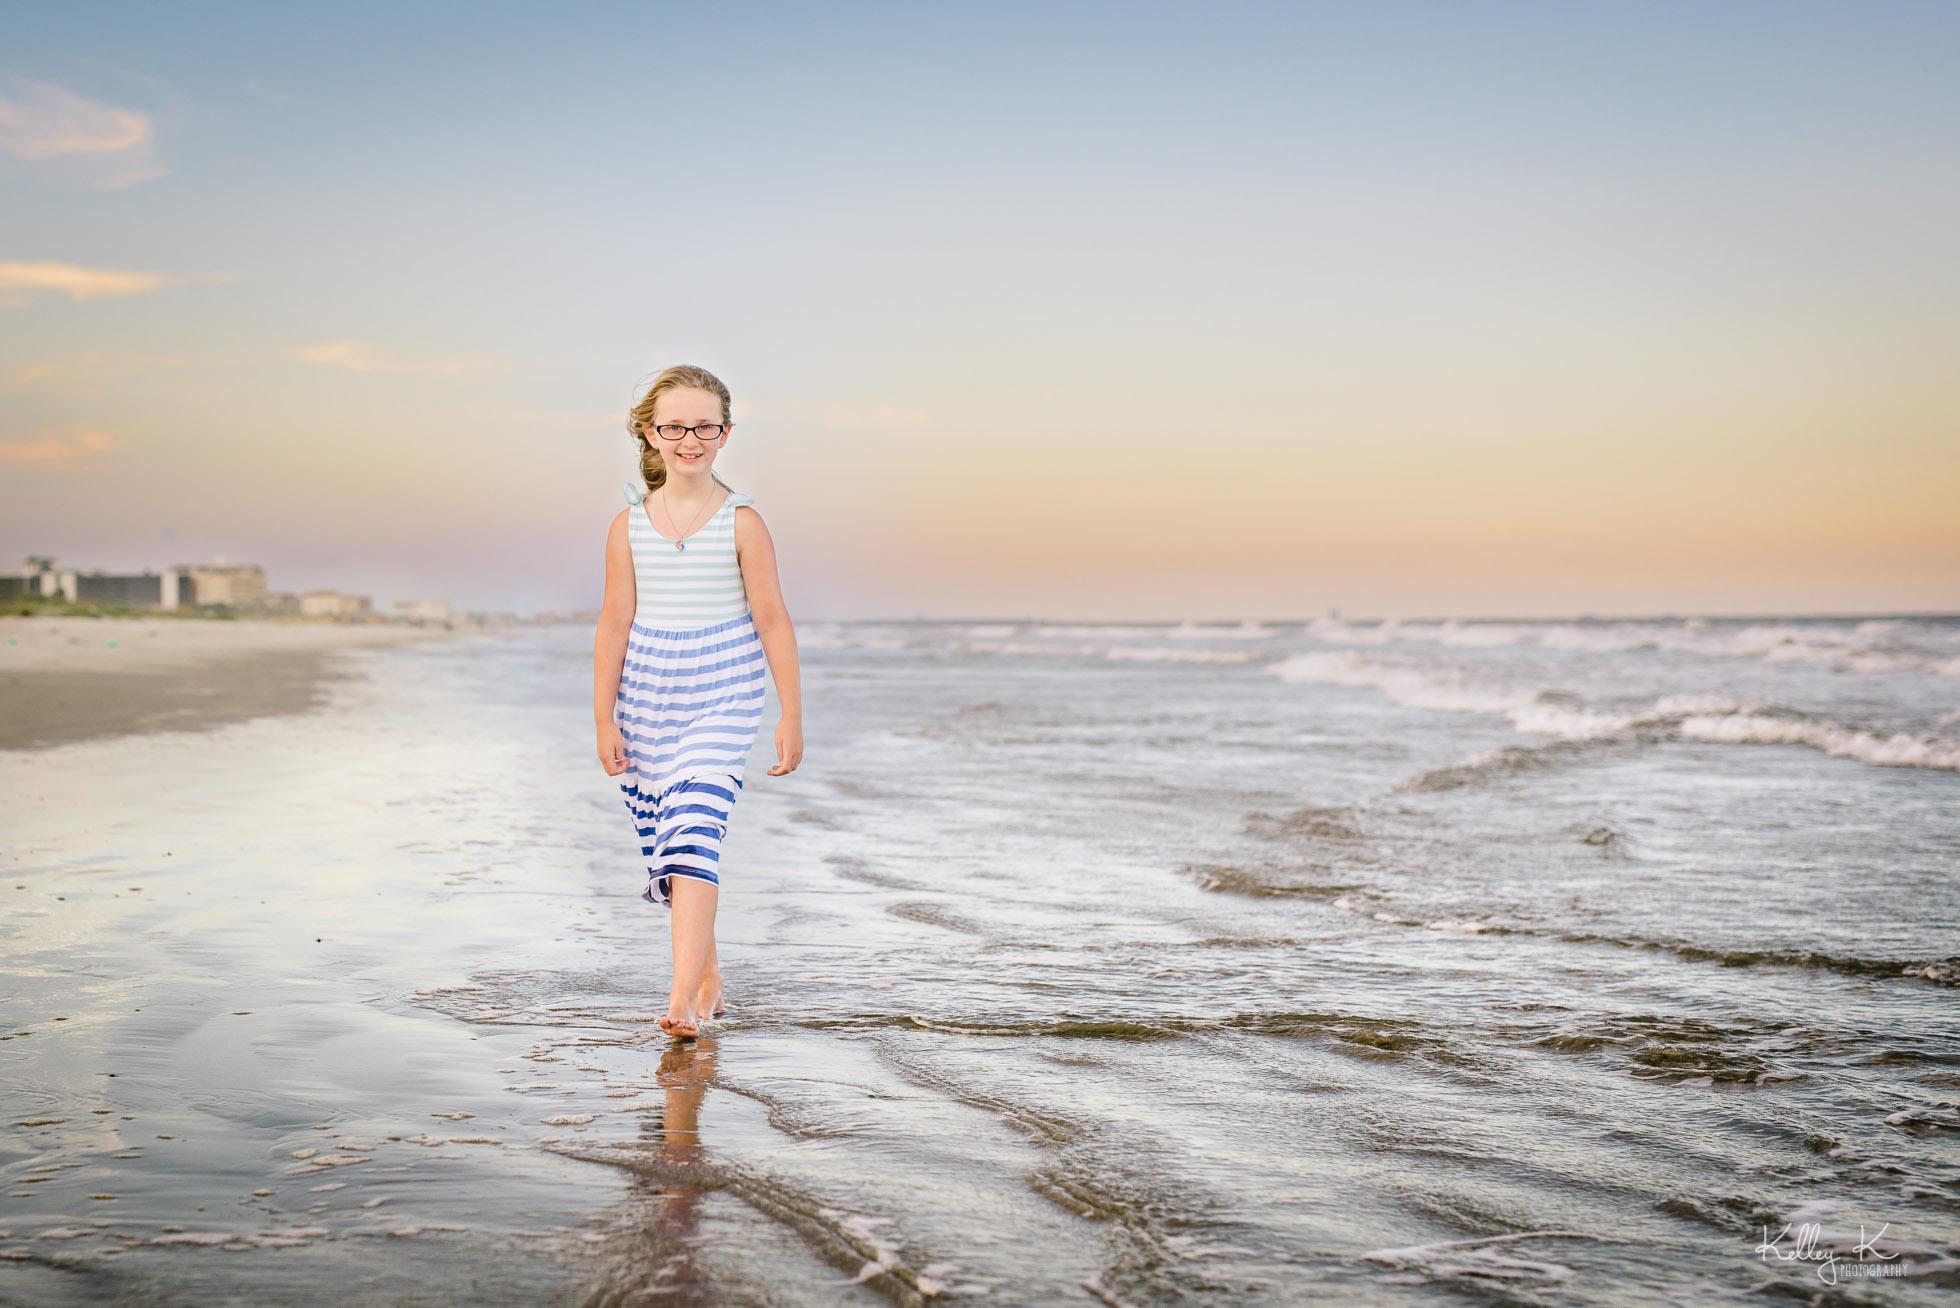 dreaming-of-the-beach-by-KelleyKPhotography-Smyrna.jpg